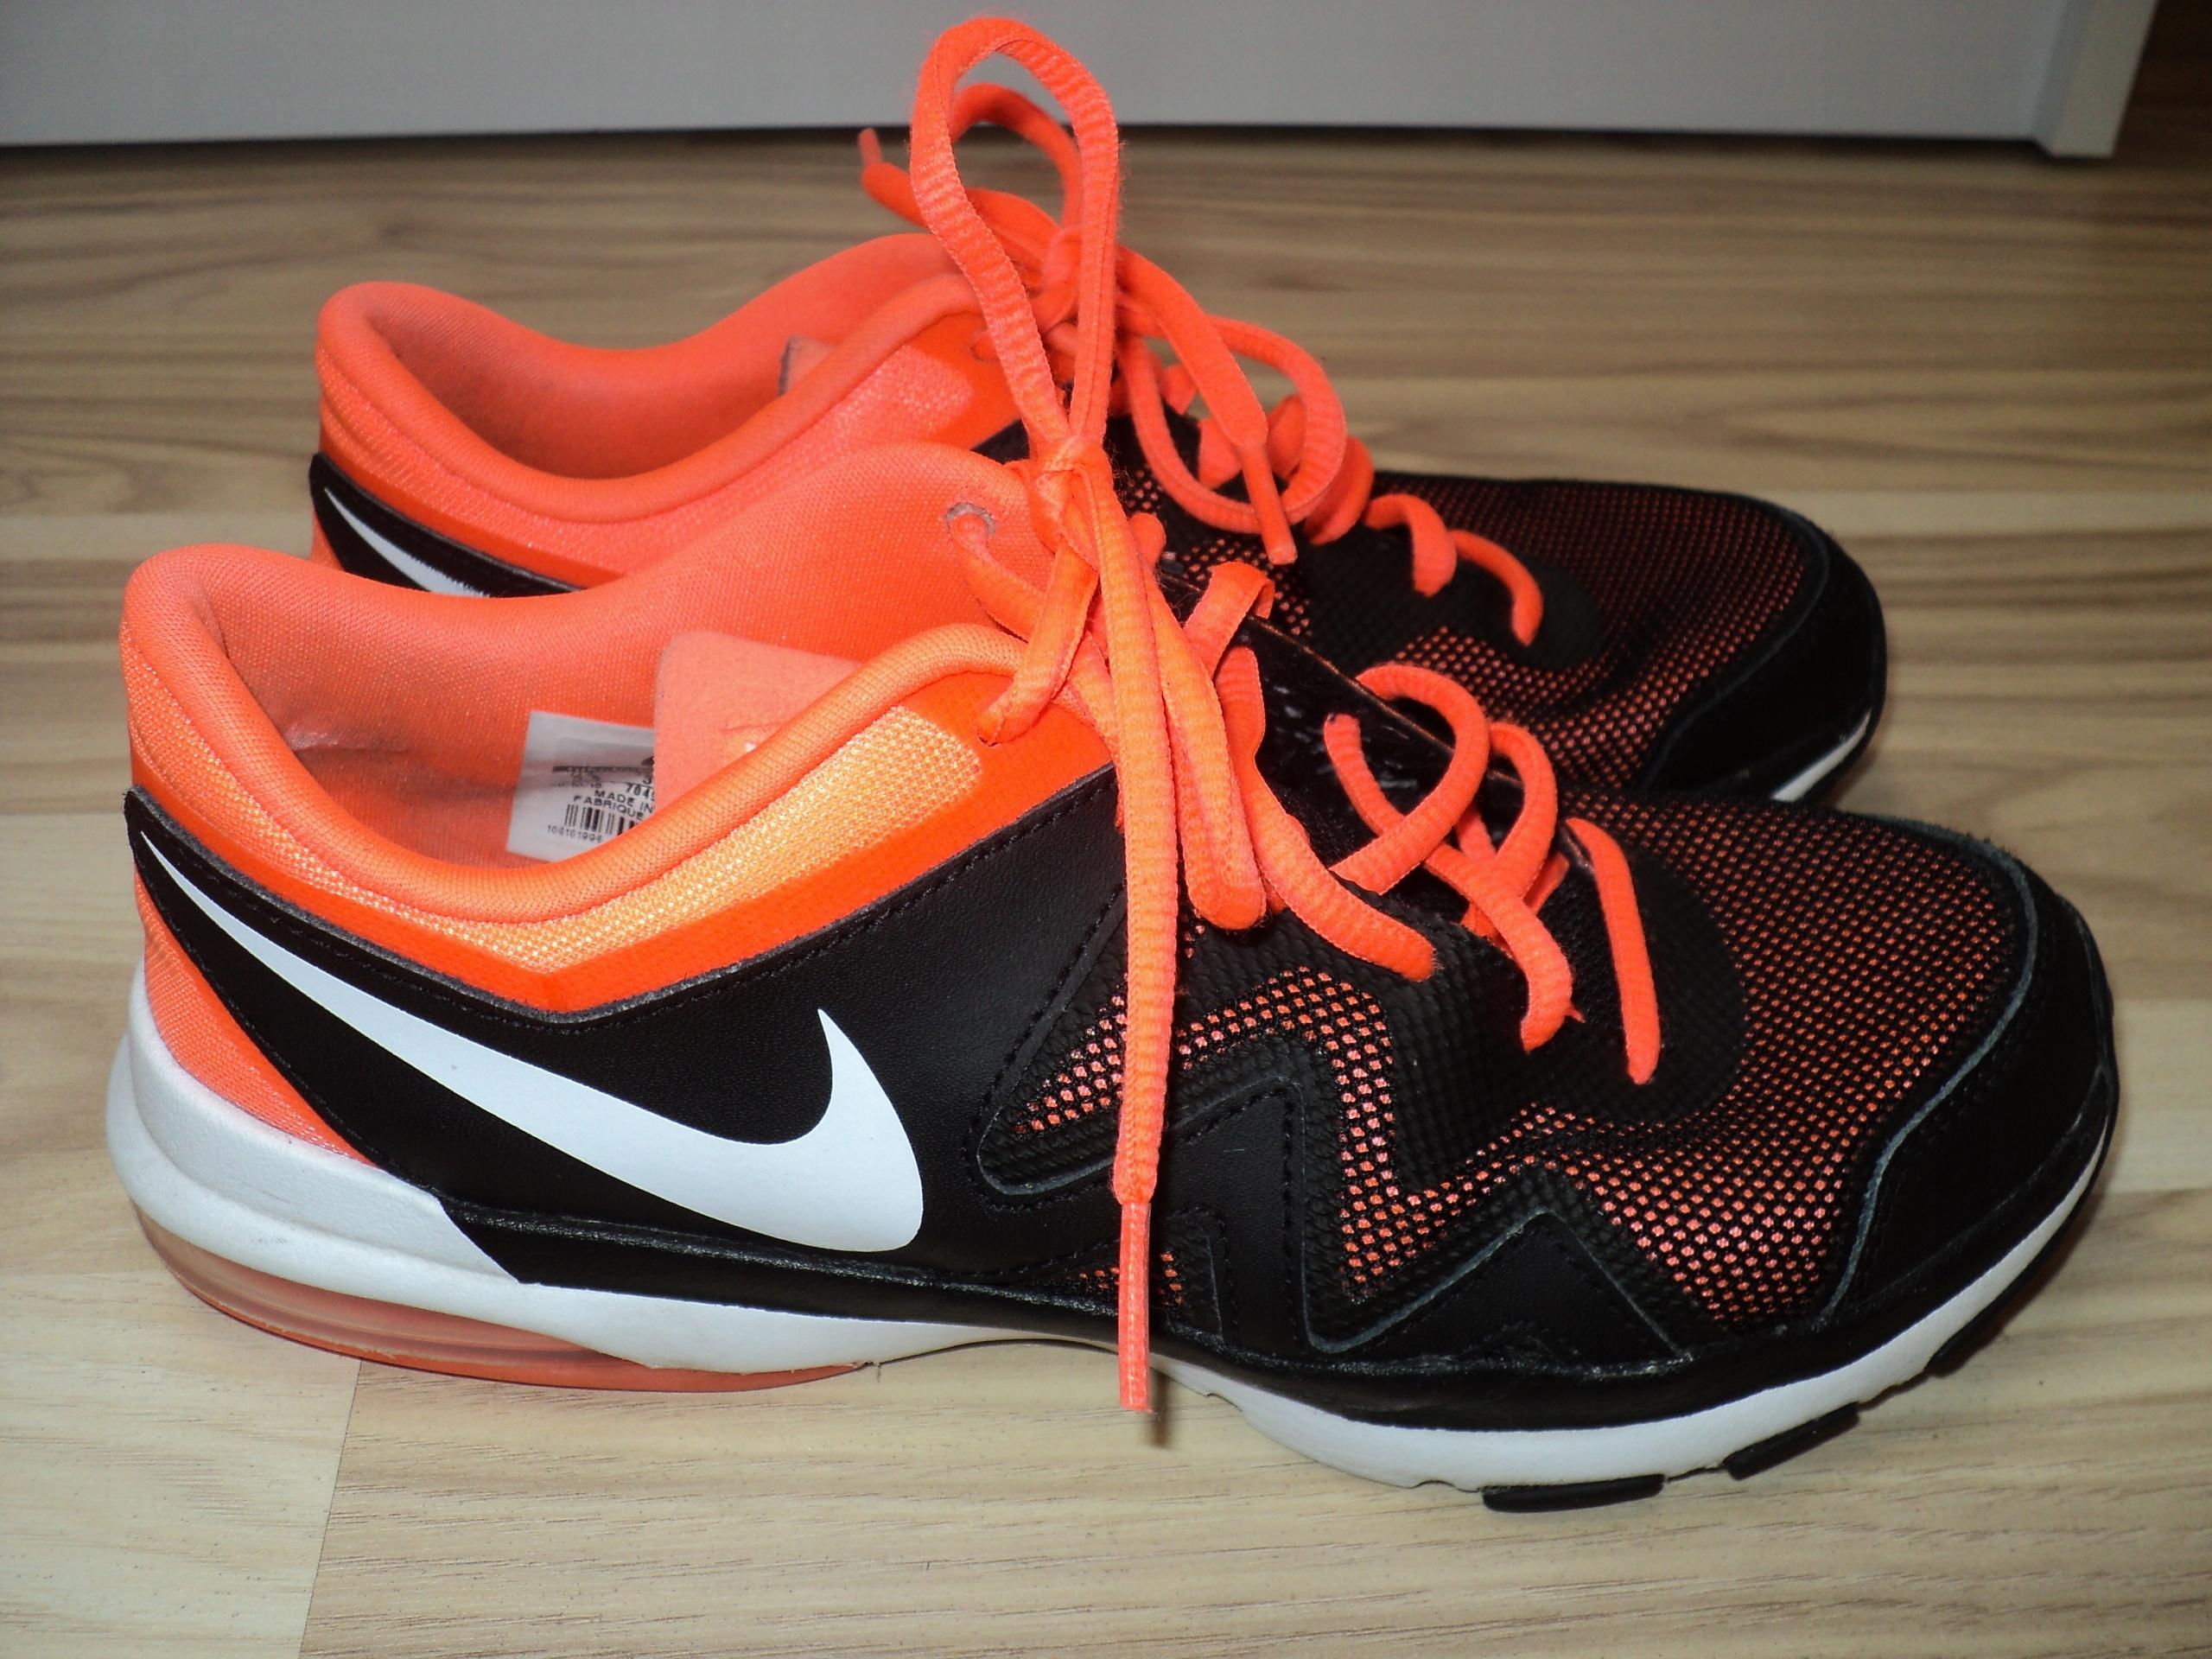 buy online 8744d 98ad4 Nike SCULPT TR2 damskie buty trening fitness 36 - 7616554215 ...